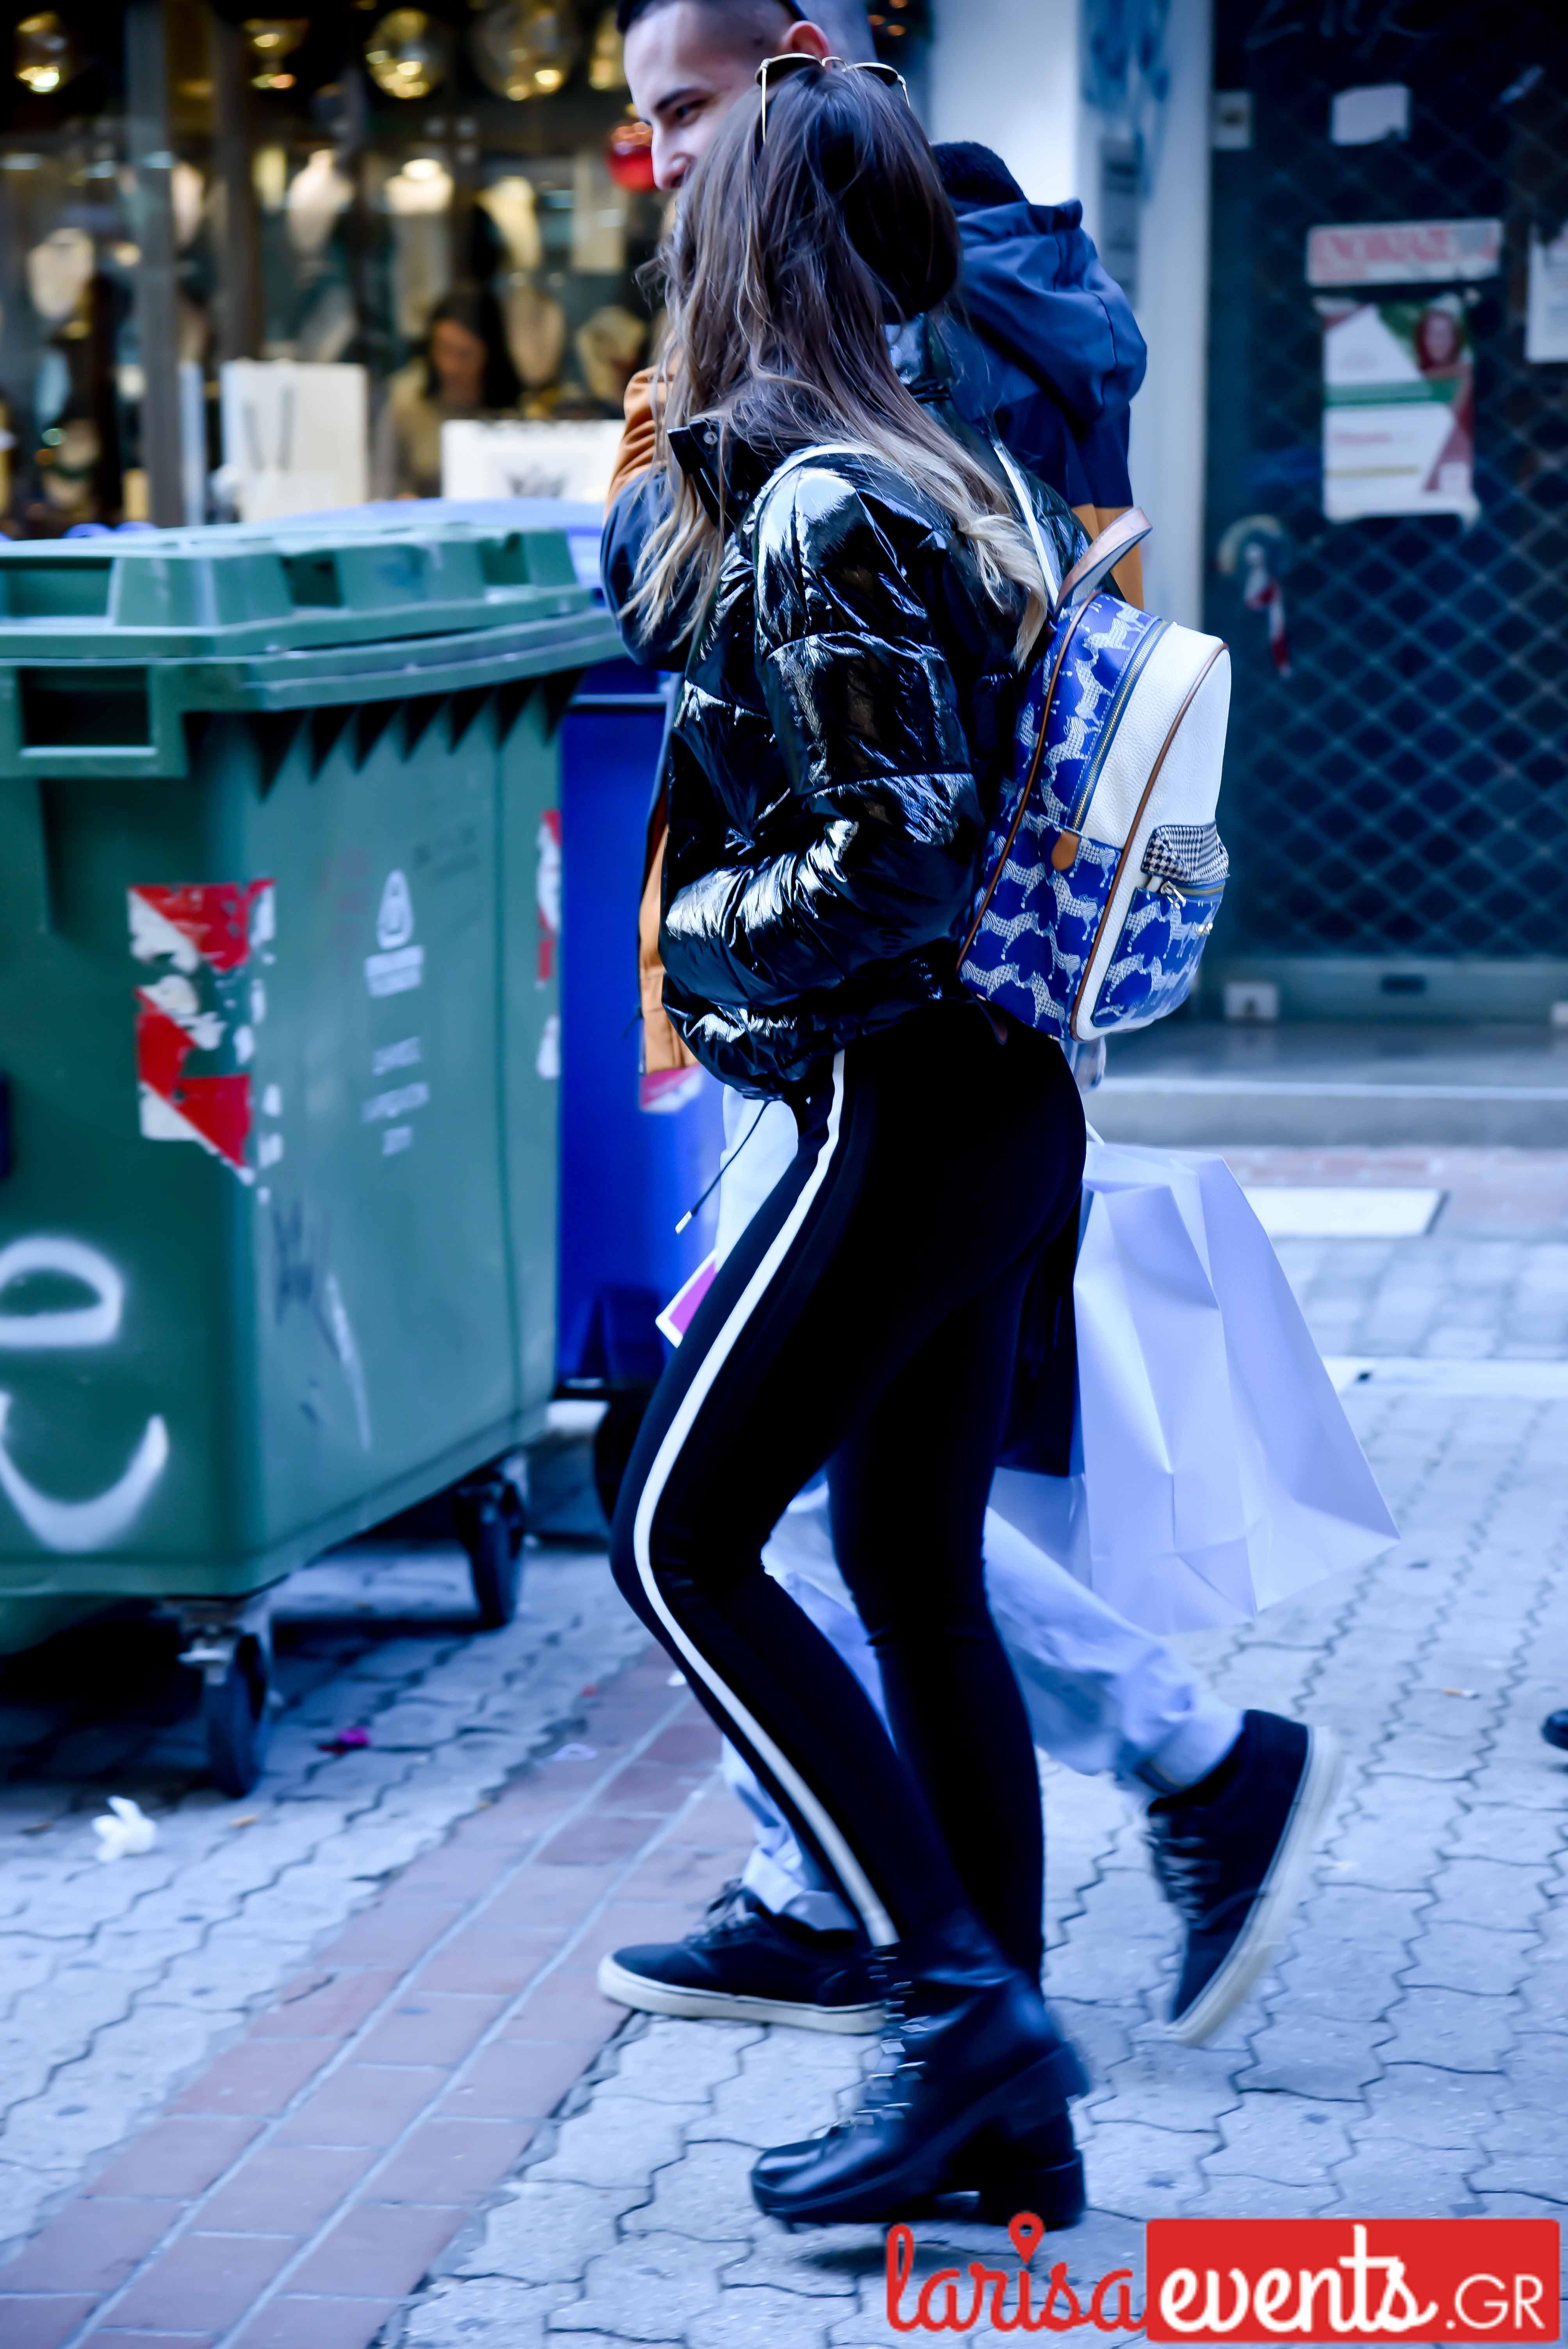 LAZ 7308 - Λάρισα's Street Style | Οι γυναίκες της πόλης σε street style clicks!